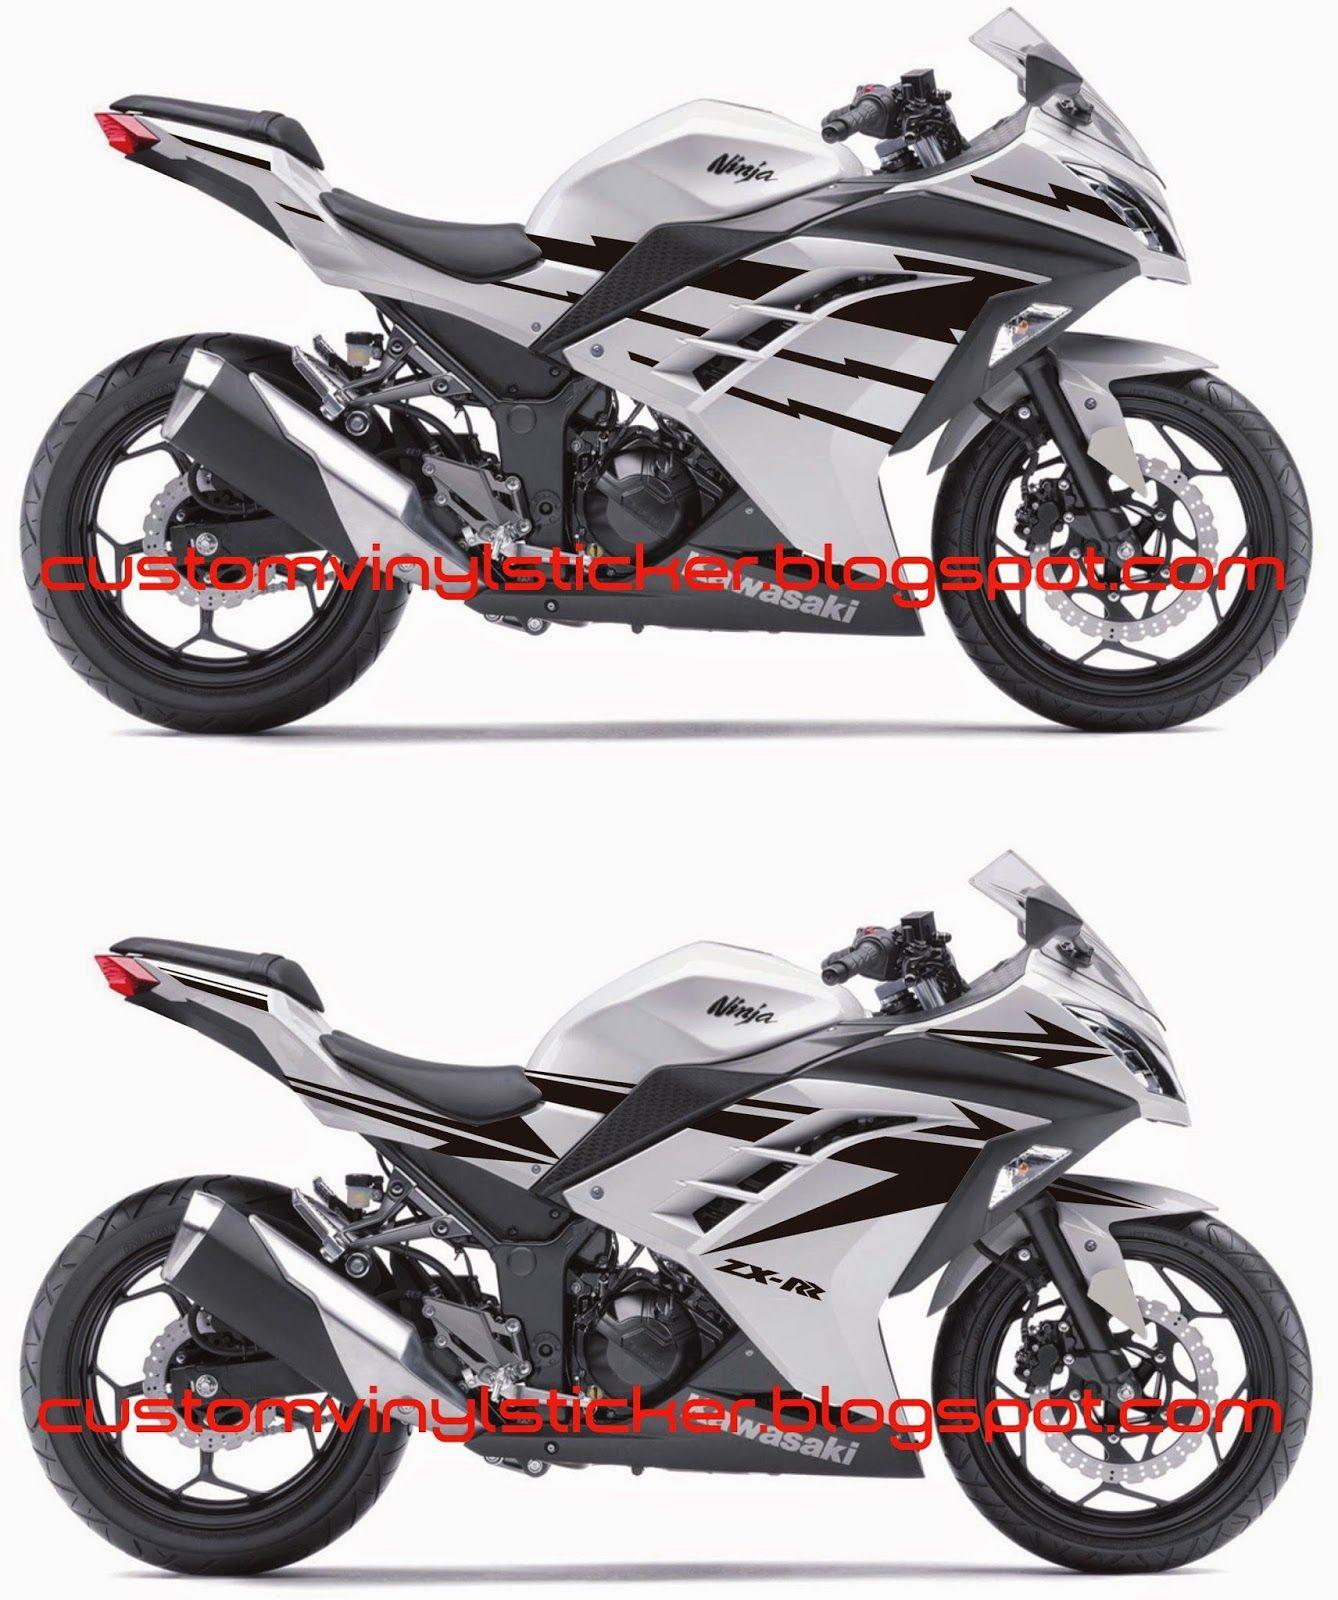 Design sticker ninja 250 - Kawasaki Ninja 250 F1 White Black Mate Striping Sticker Concept